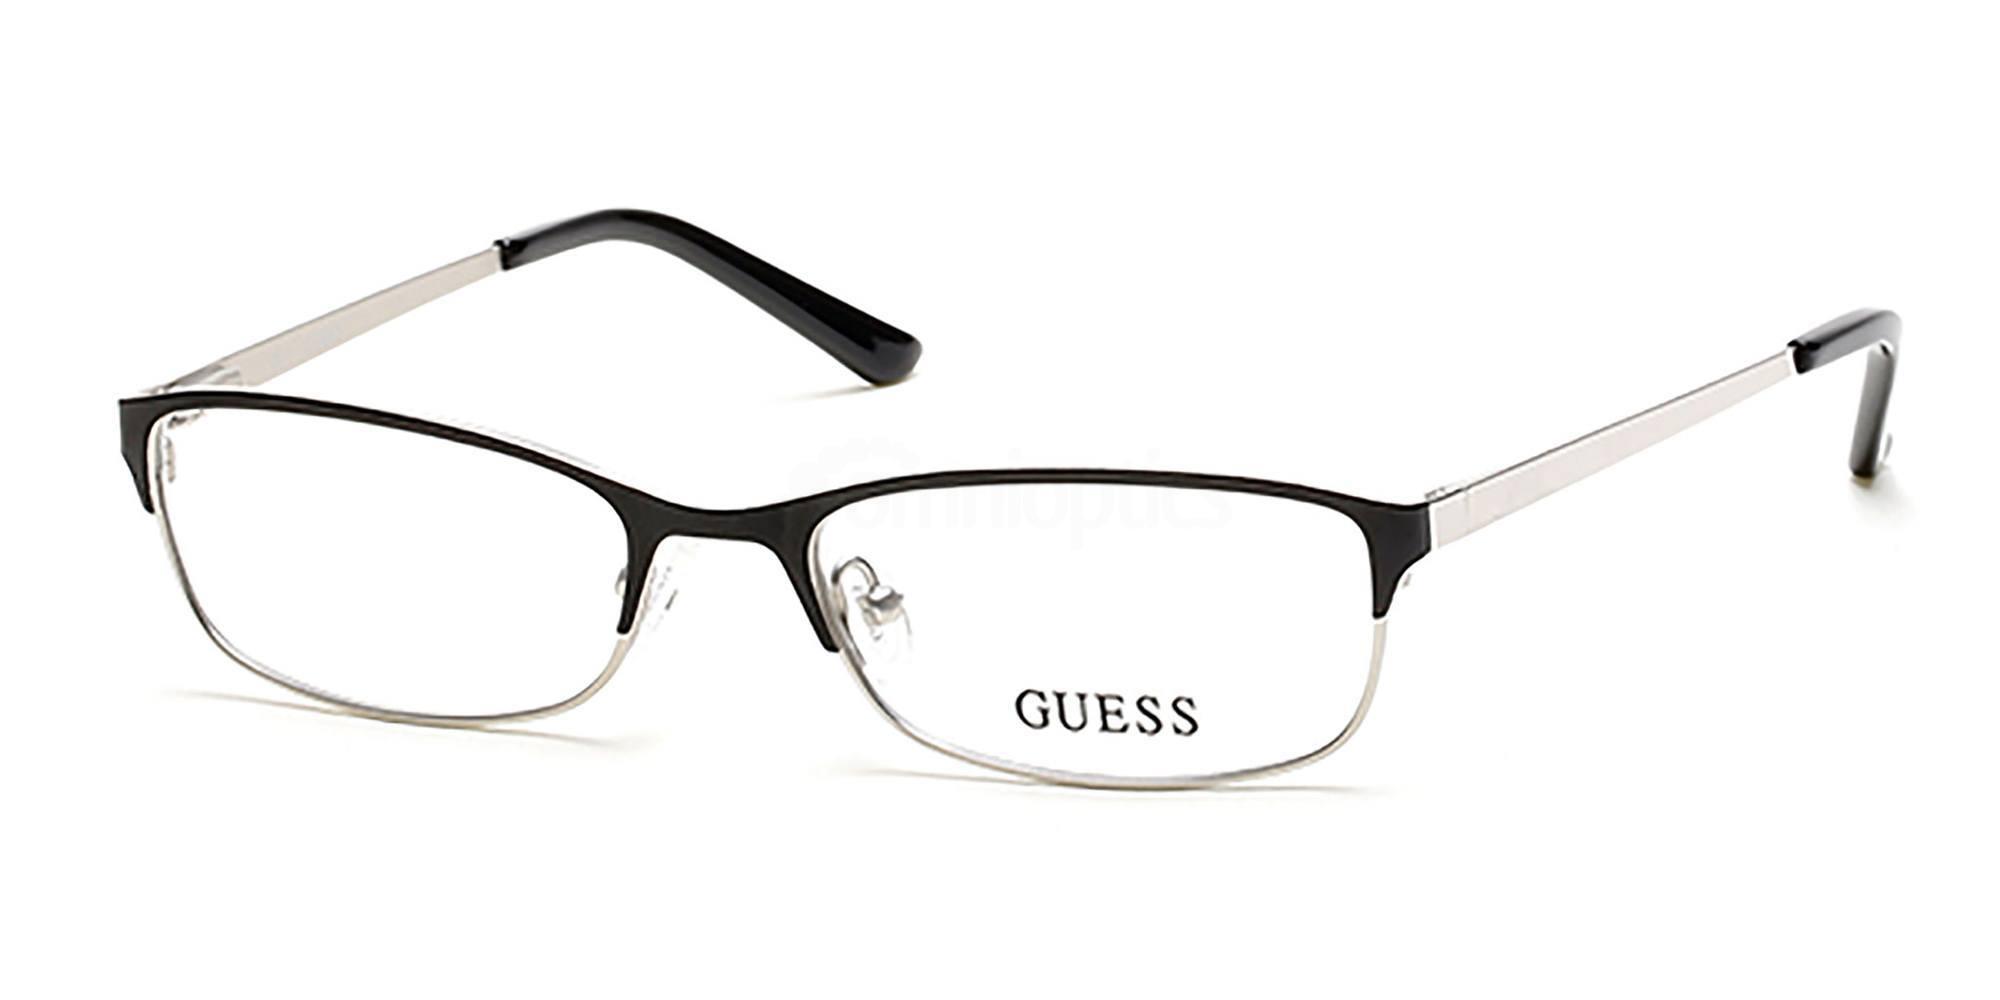 001 GU2544 , Guess